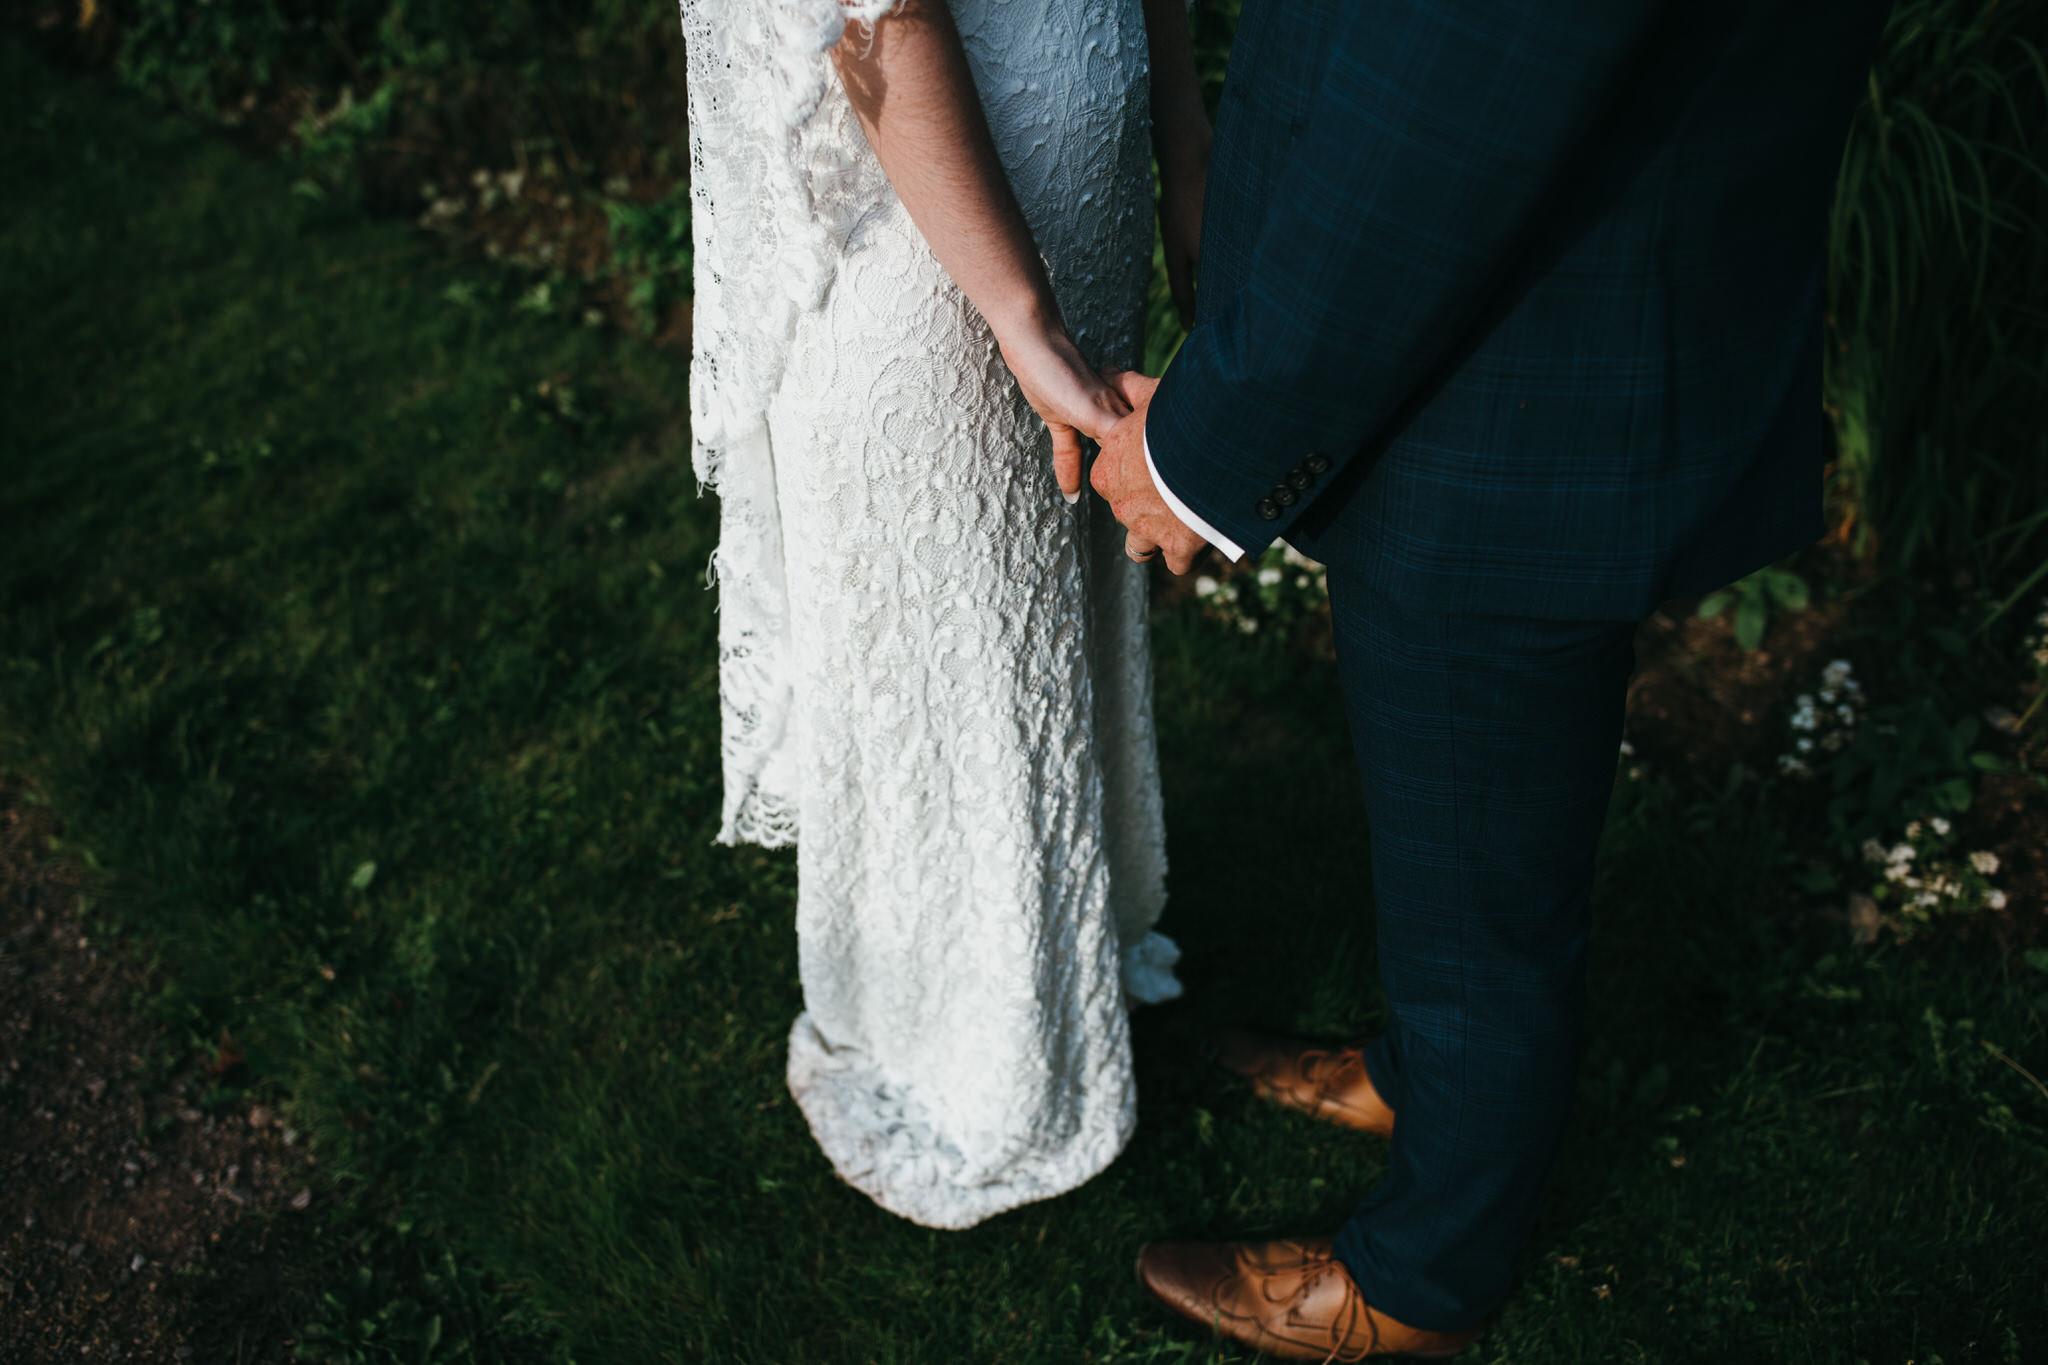 Hestercombe bride and groom